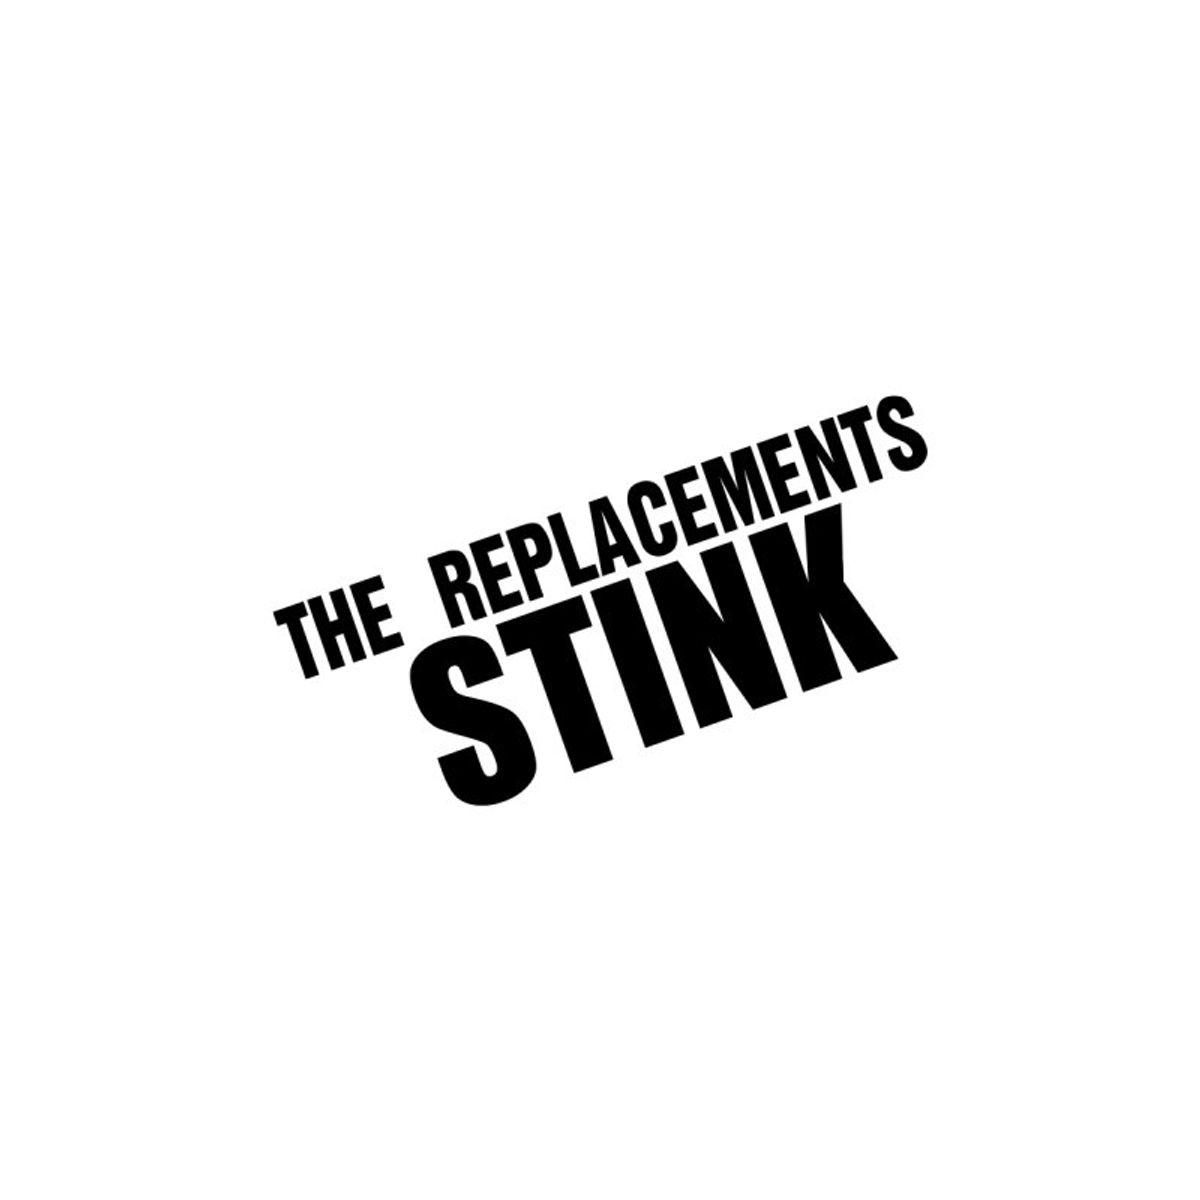 #Kickstarters - The Replacements - Kids Don't Follow (1982)